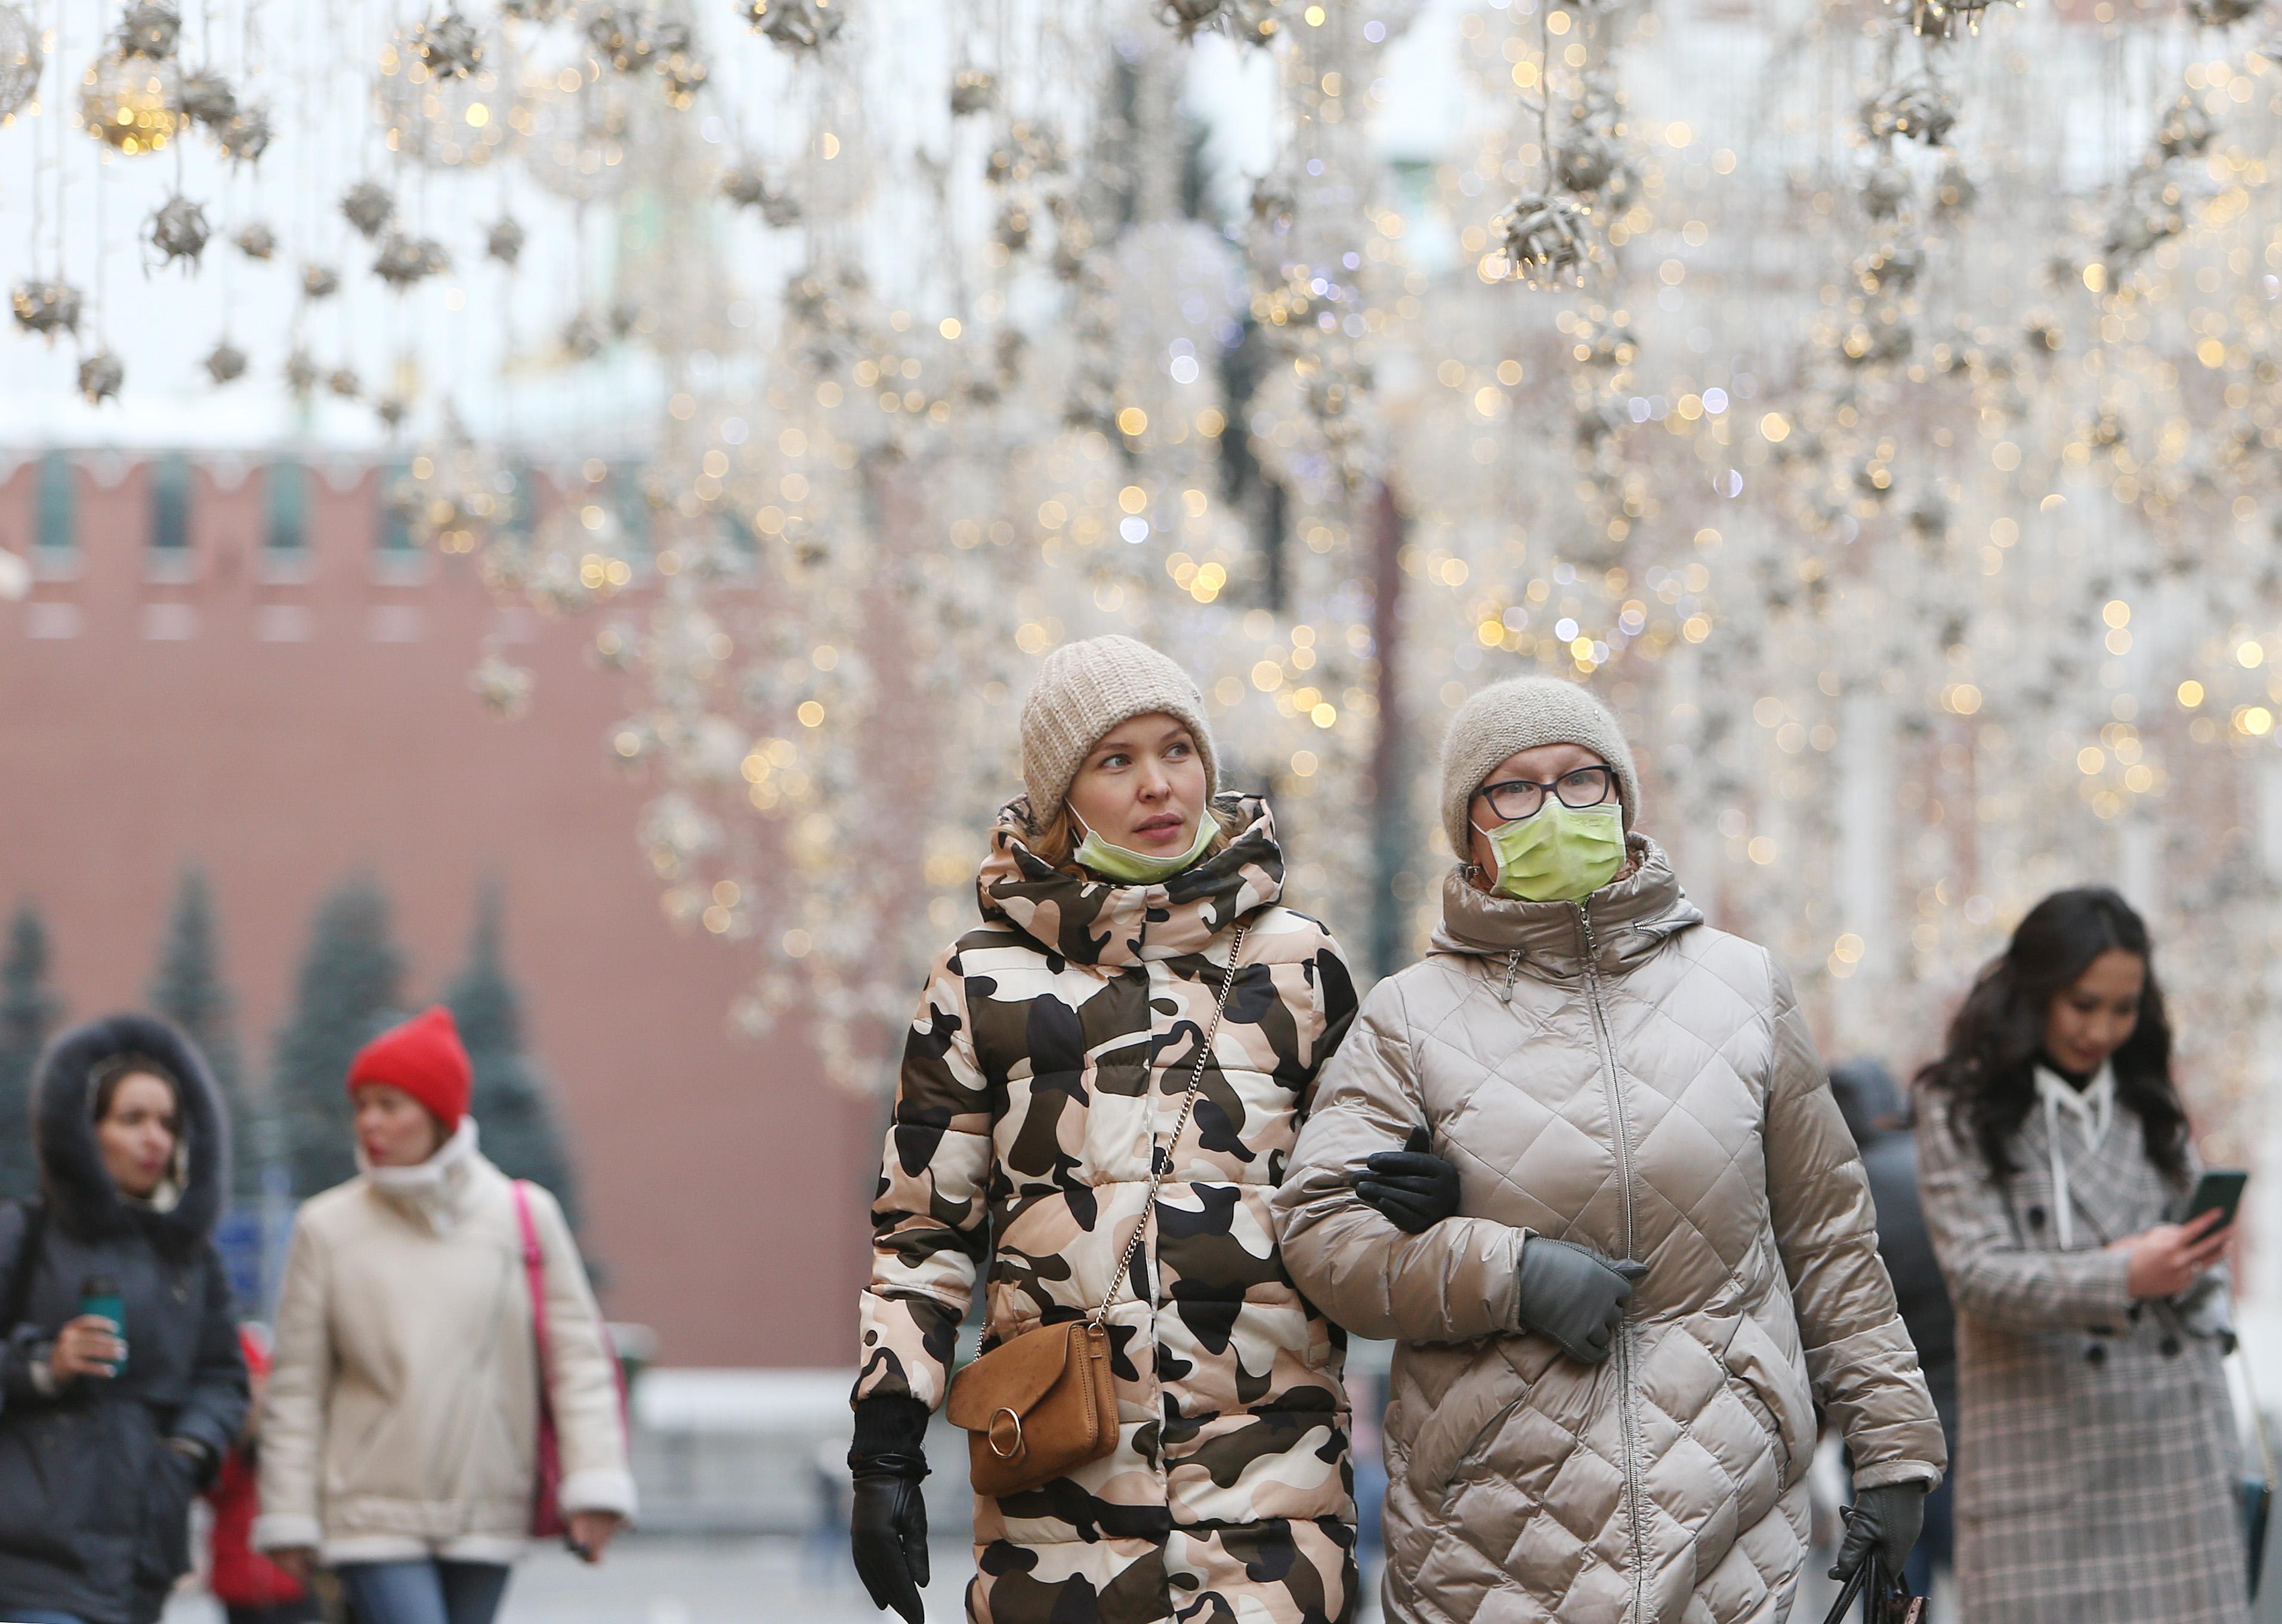 Синоптики спрогнозировали облачную погоду в столице в пятницу. Фото: Наталия Нечаева, «Вечерняя Москва»